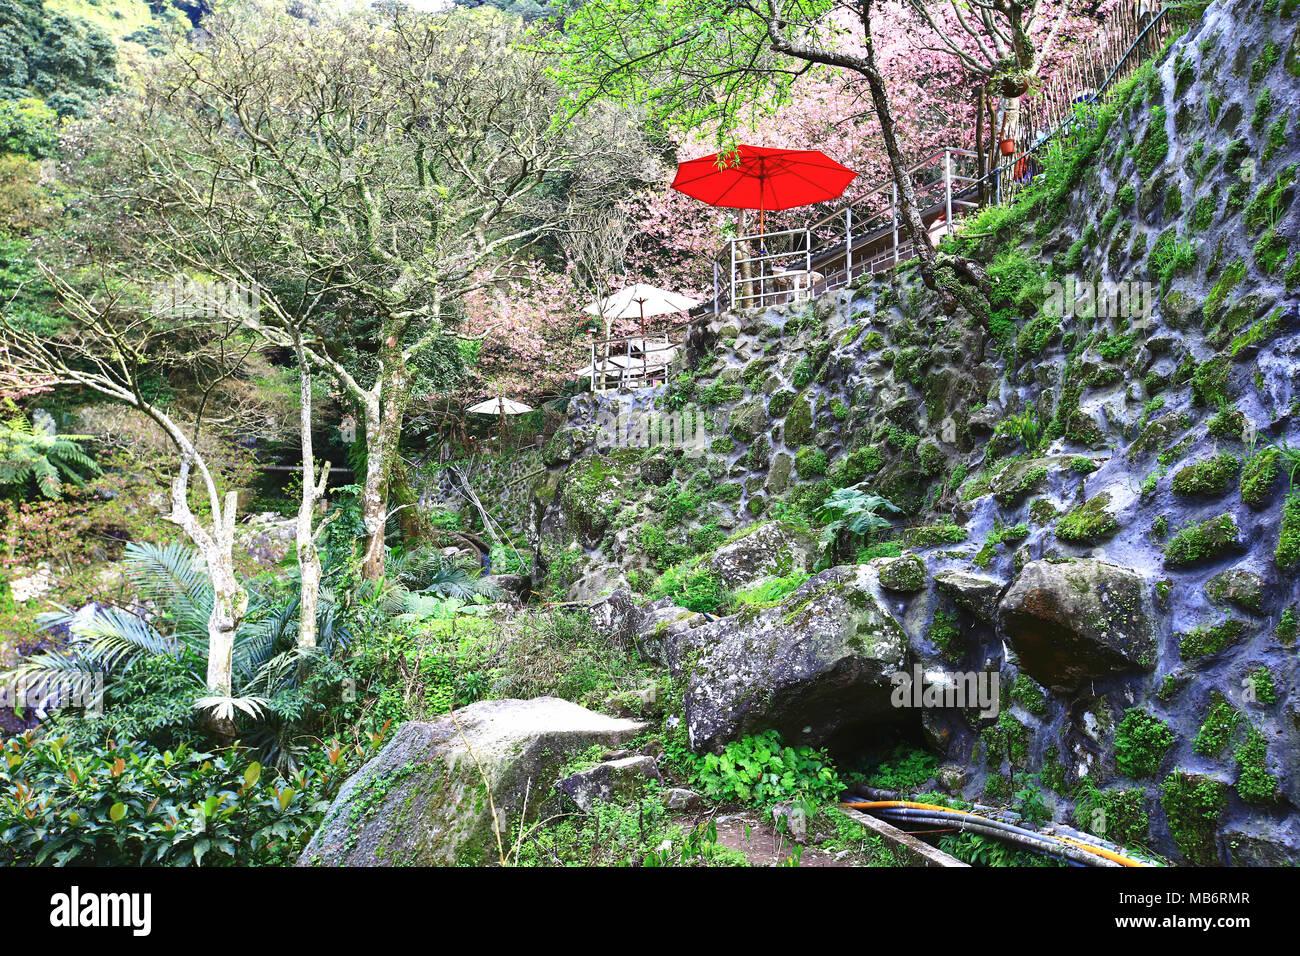 Beautiful garden scenery with cherry blossoms flowers and trees in beautiful garden scenery with cherry blossoms flowers and trees in the valley izmirmasajfo